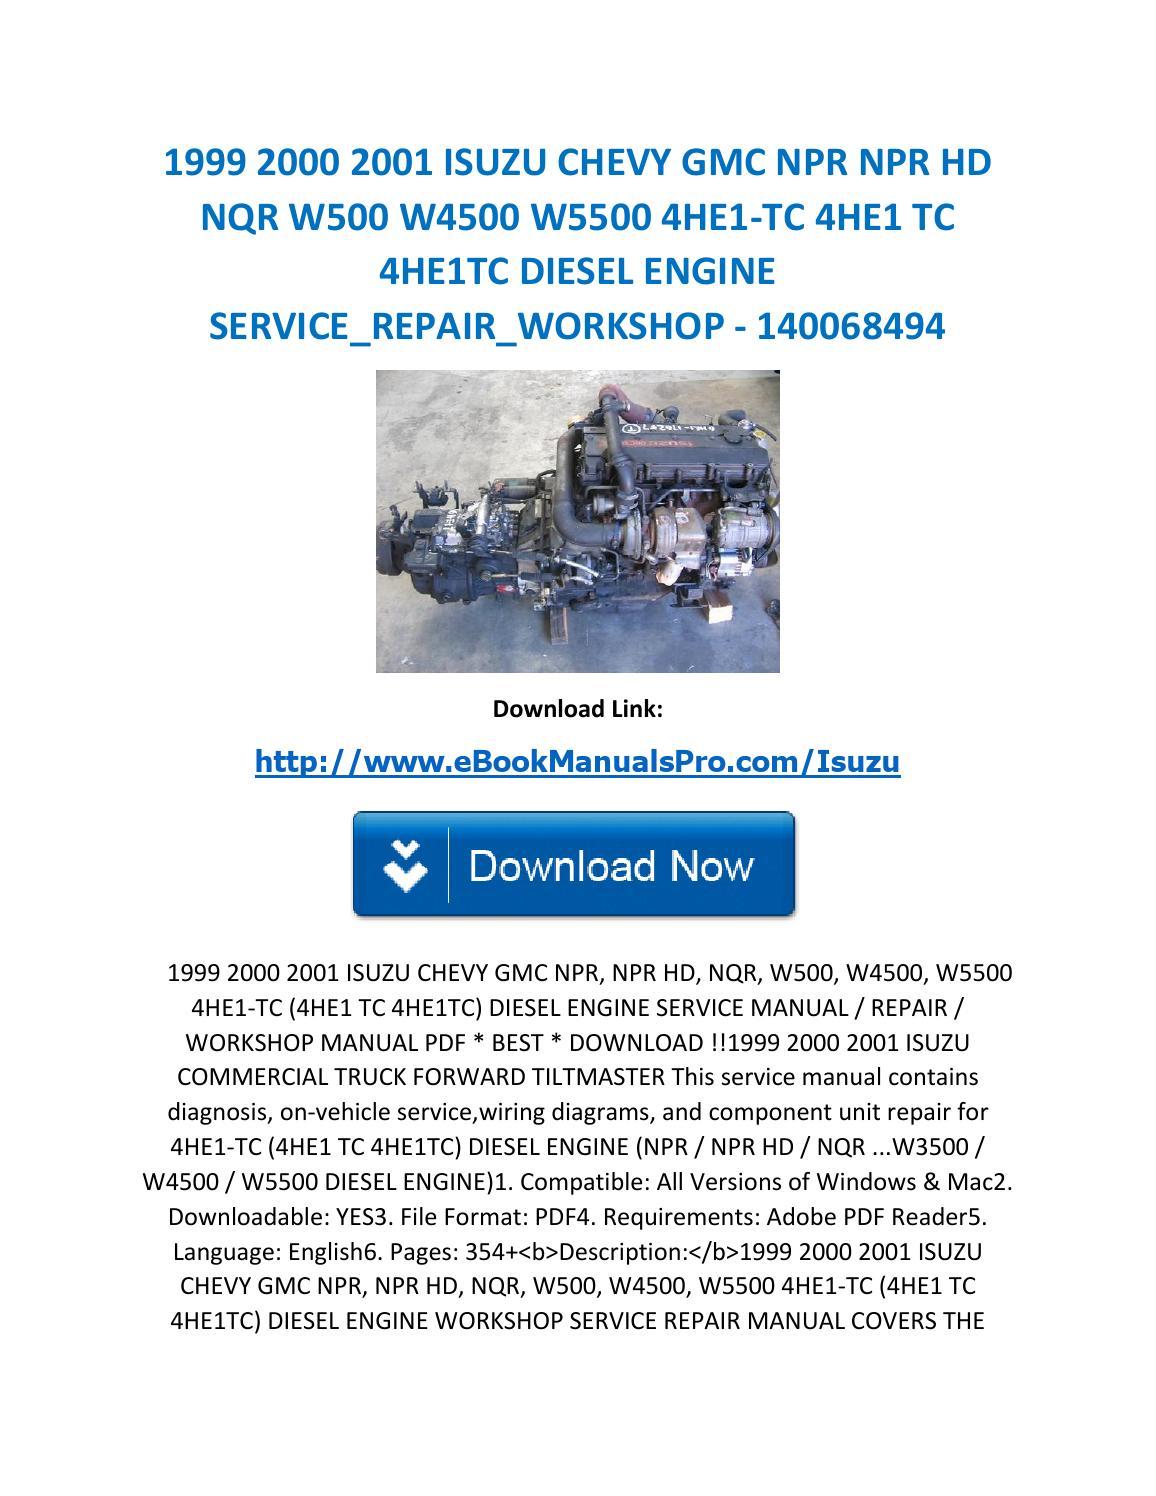 hight resolution of 2001 isuzu npr manual isuzu service manual 2001 isuzu npr manual pdf wiring diagrams with a 0 2007 isuzu npr service manual pdf isuzu npr service manual